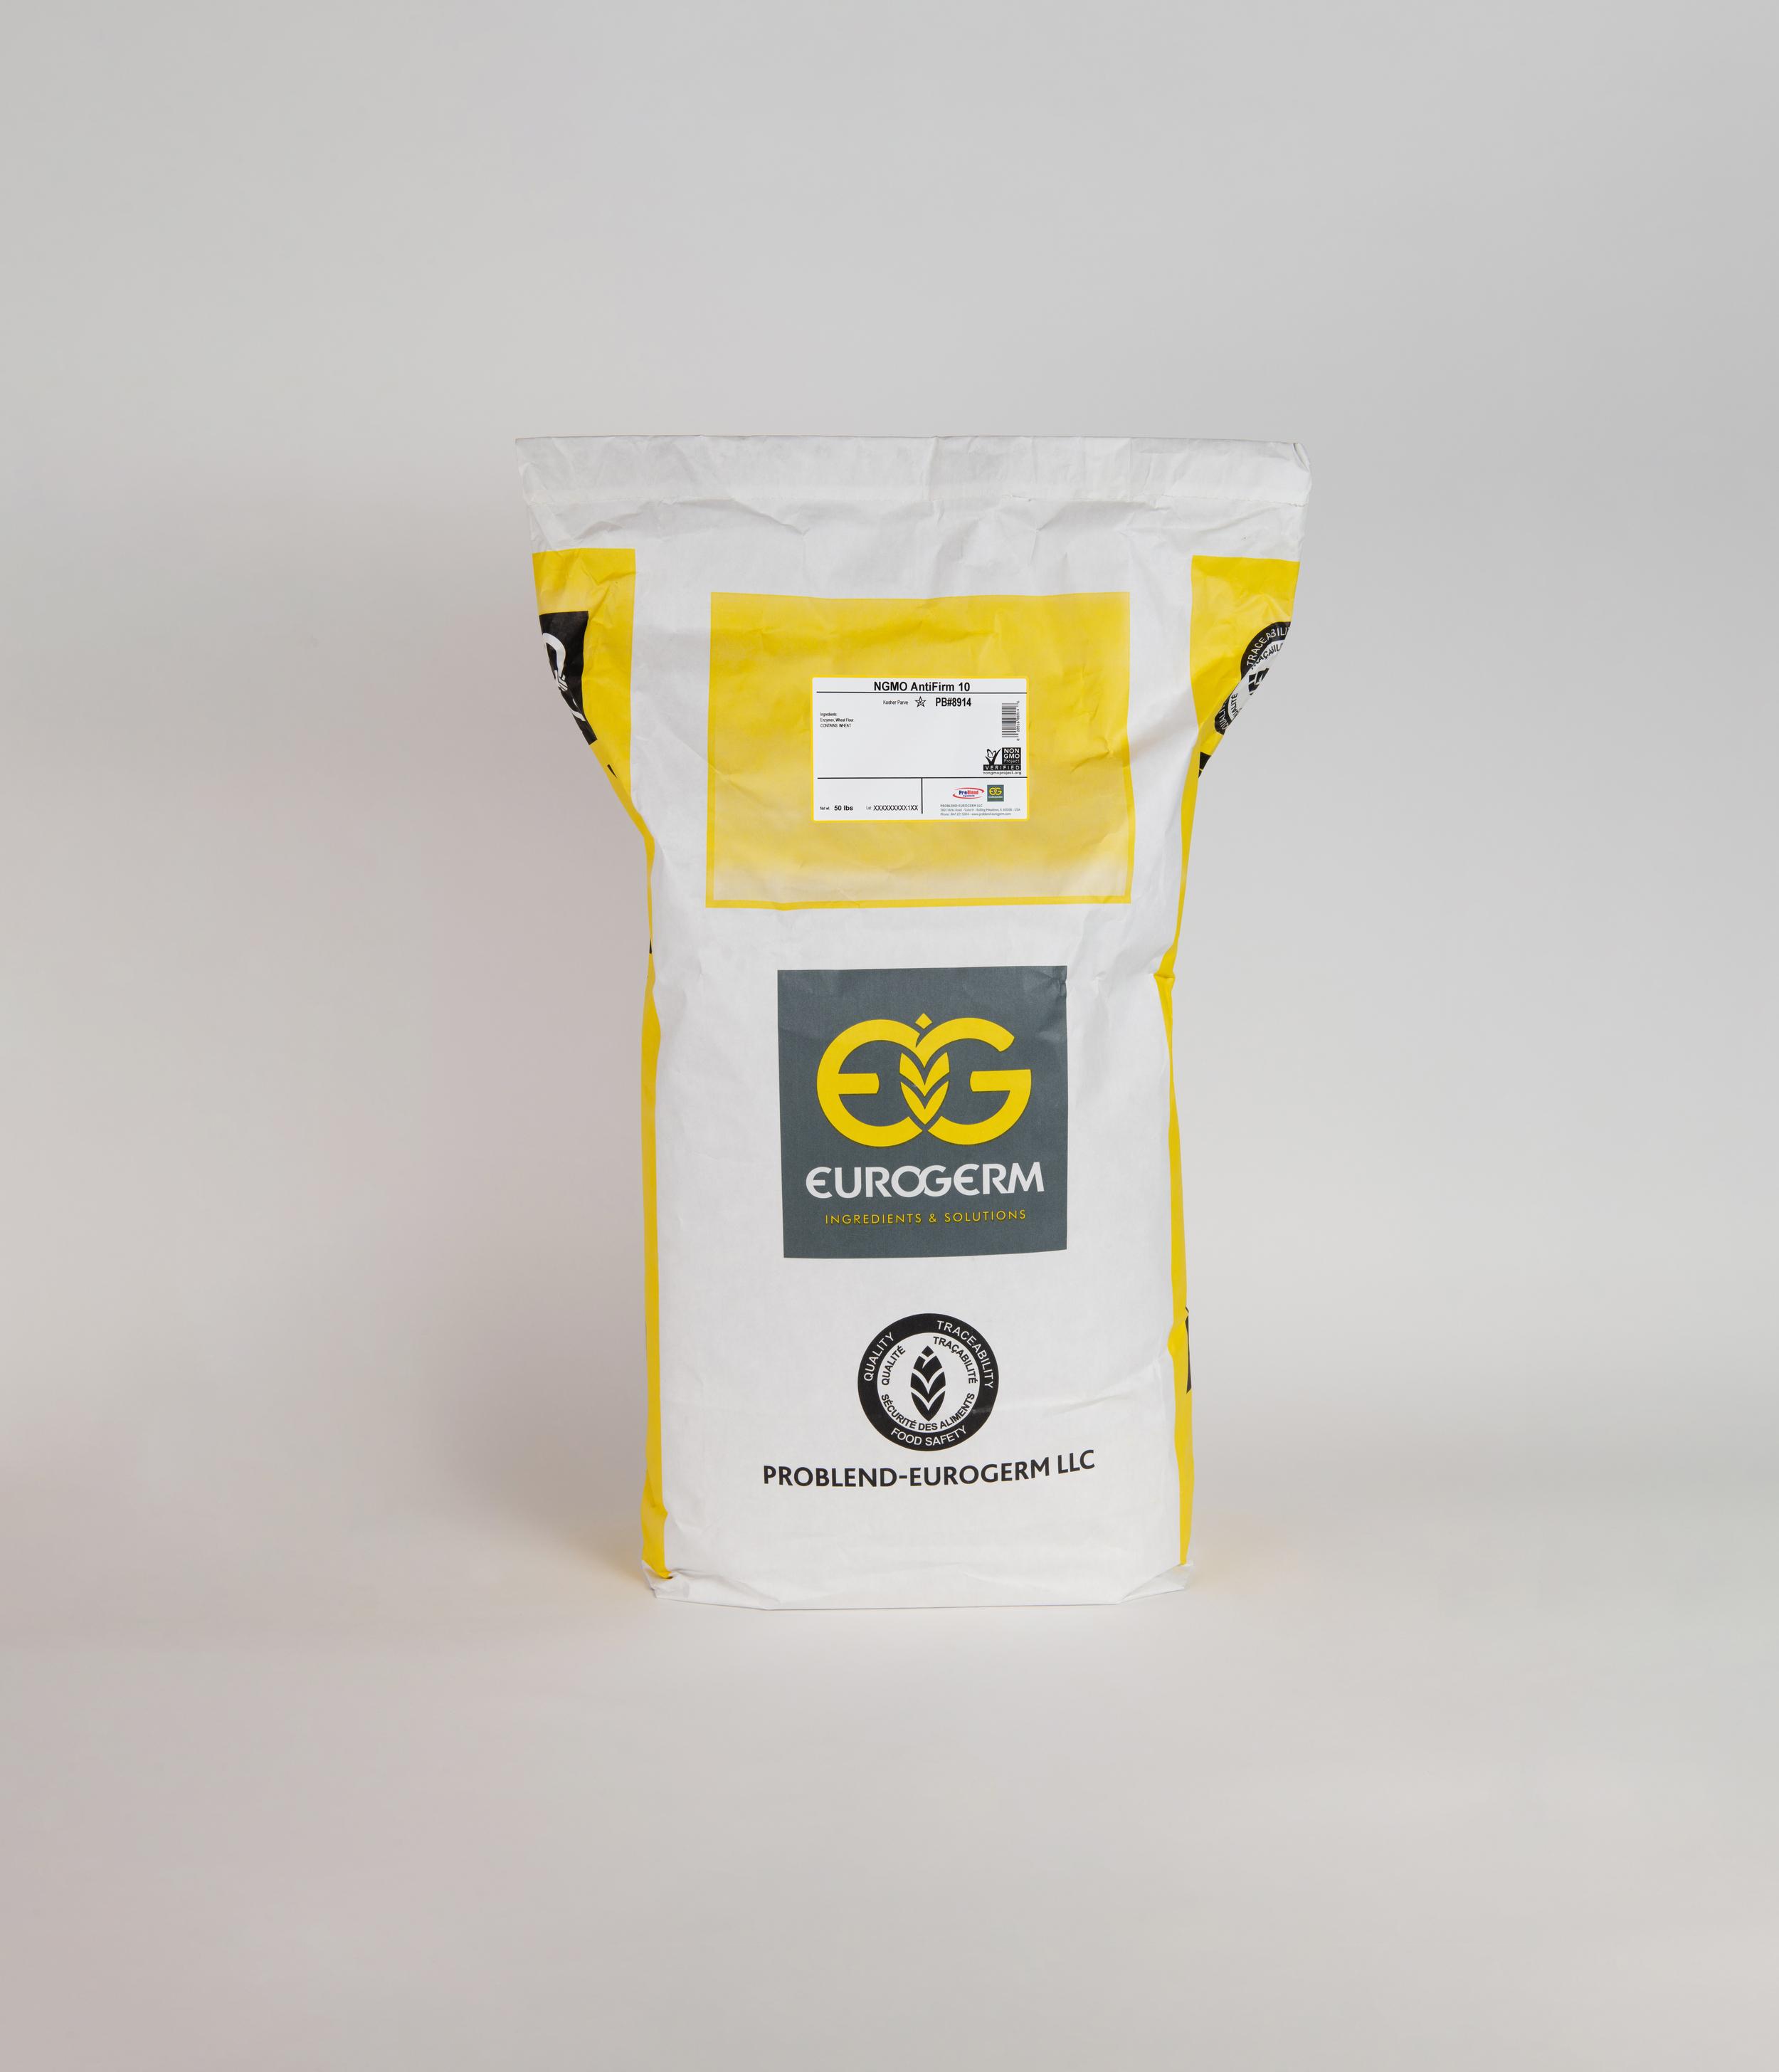 Ngmo Antifirm 10 - Non-GMO Yeast Raised Shelf Life Extender (Item #8914 Eurogerm) main image